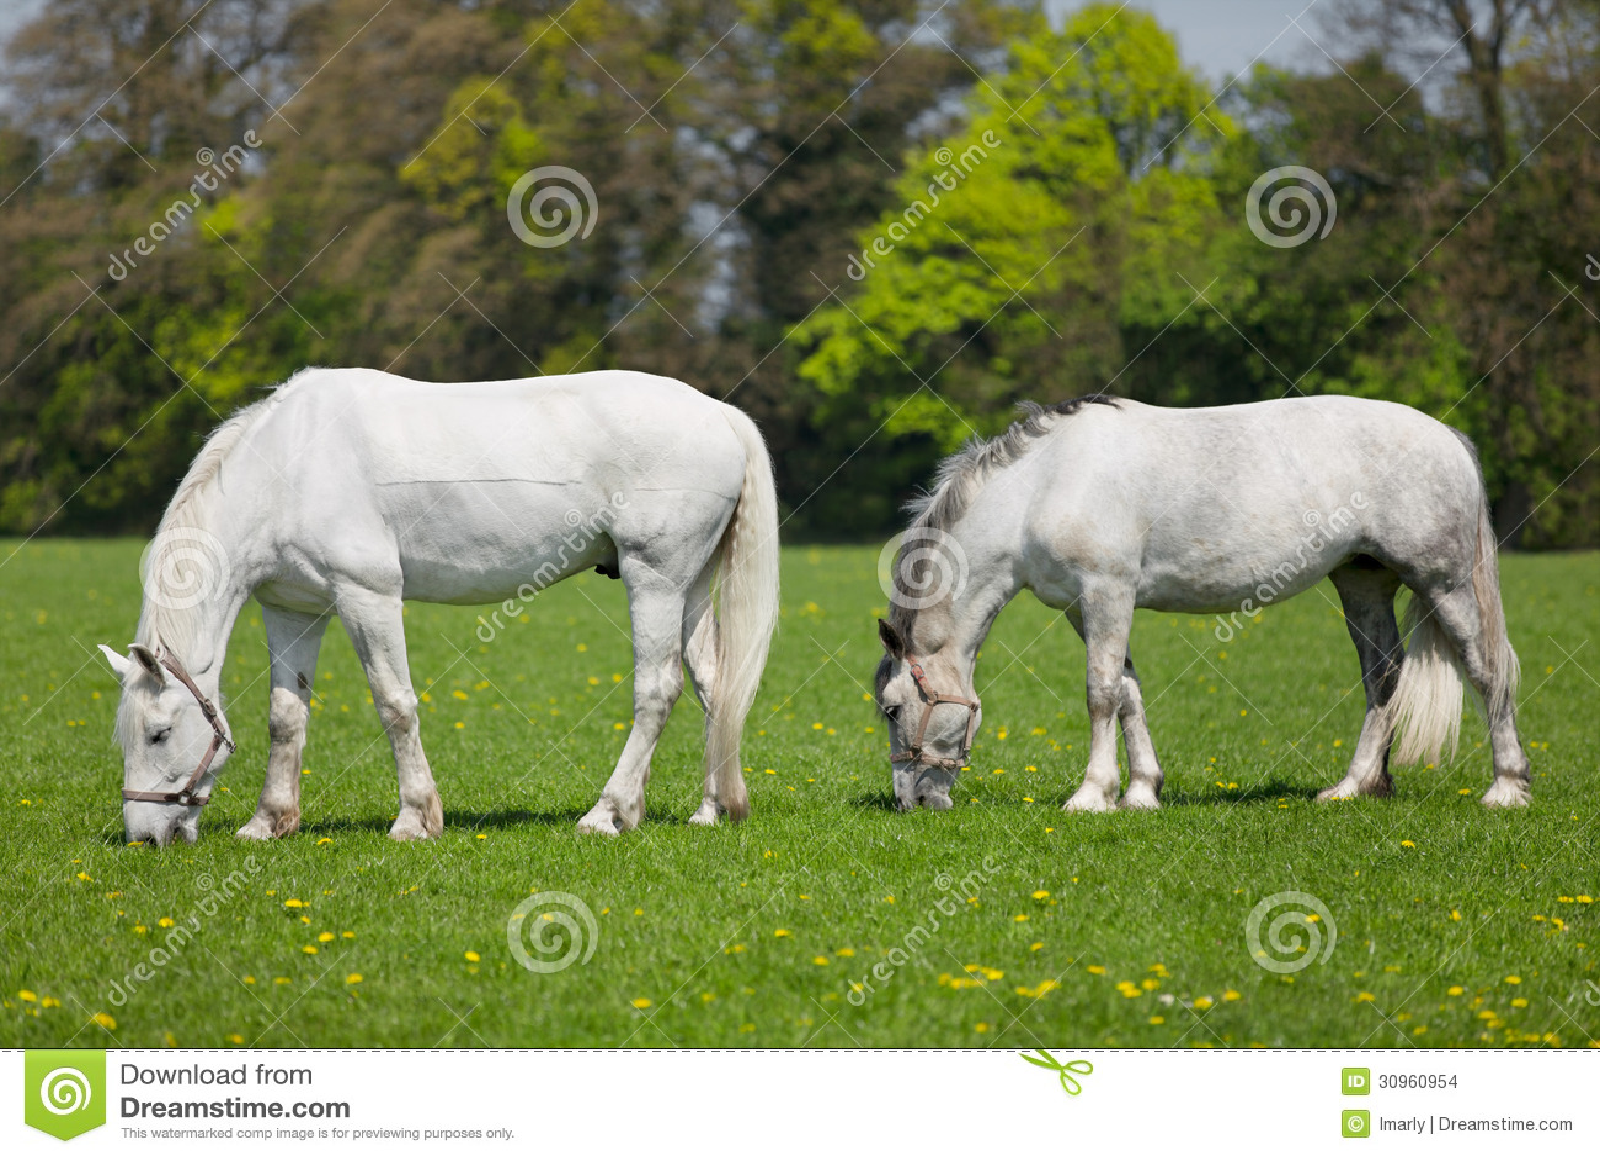 White horse eating grass - photo#8